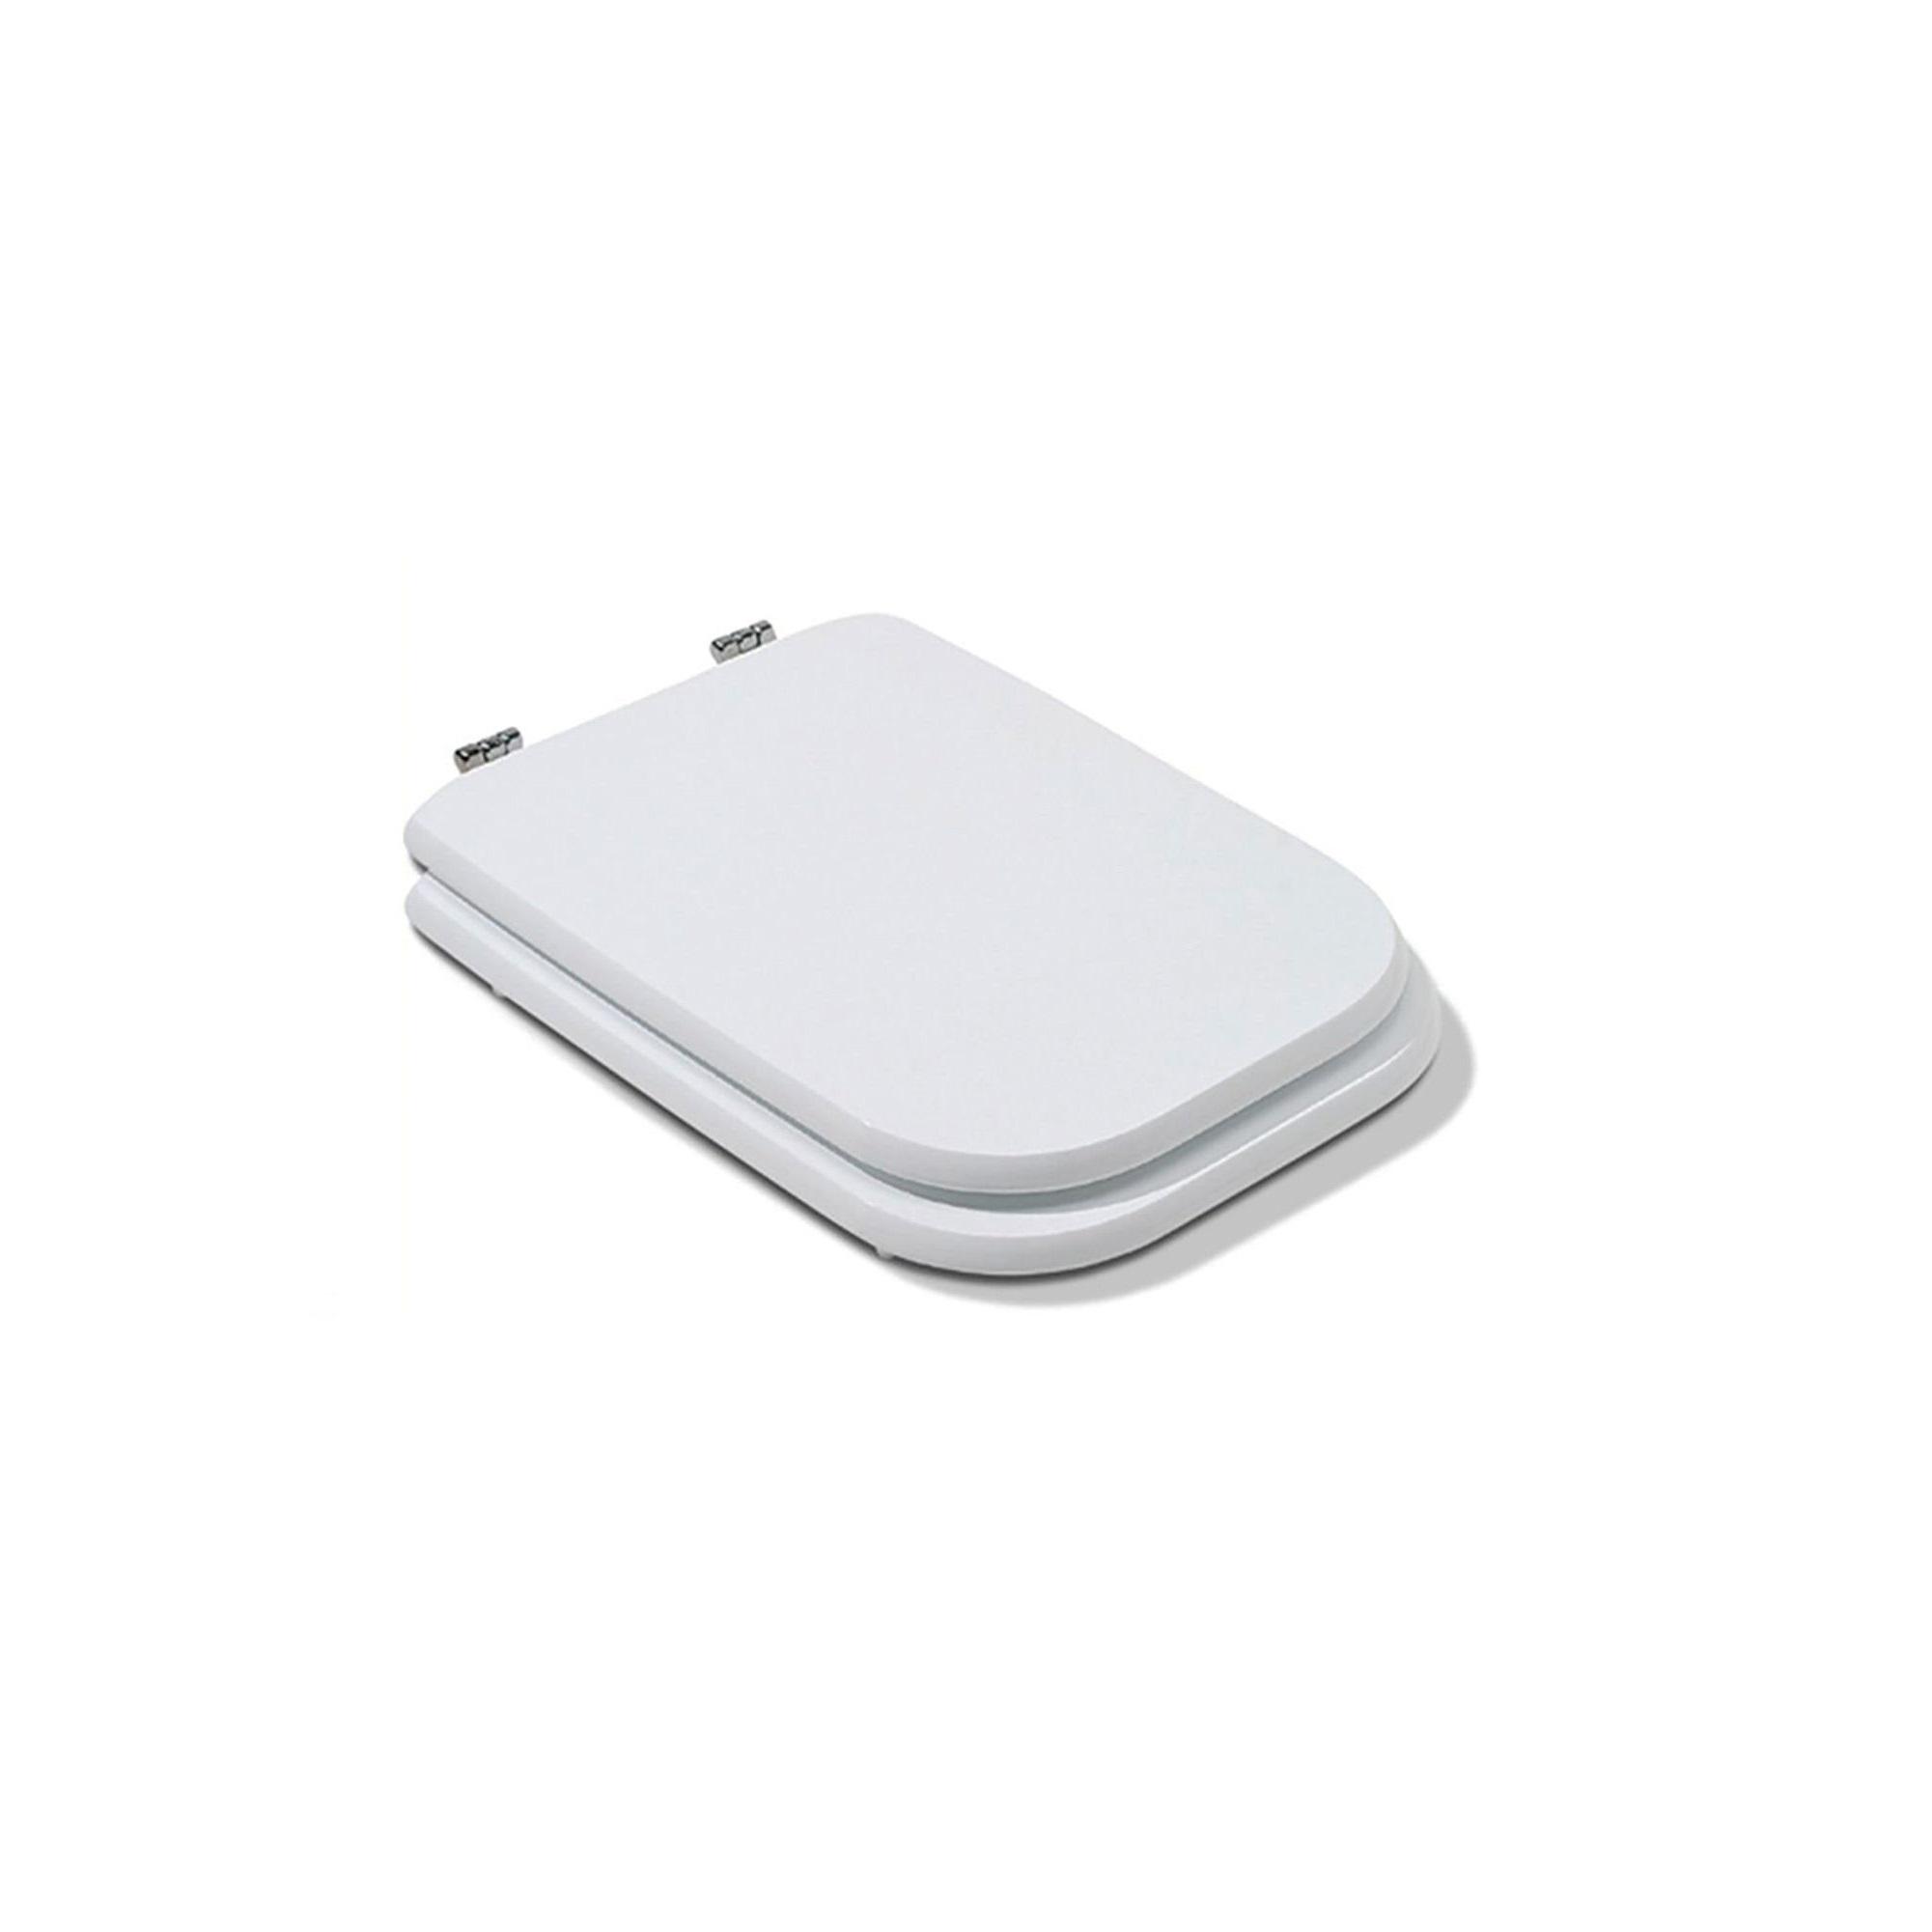 Ideal Standard Sedile Conca.Sedile Compatibile Conca Bianco Ideal Standard Legno Mdf Con Cerniere